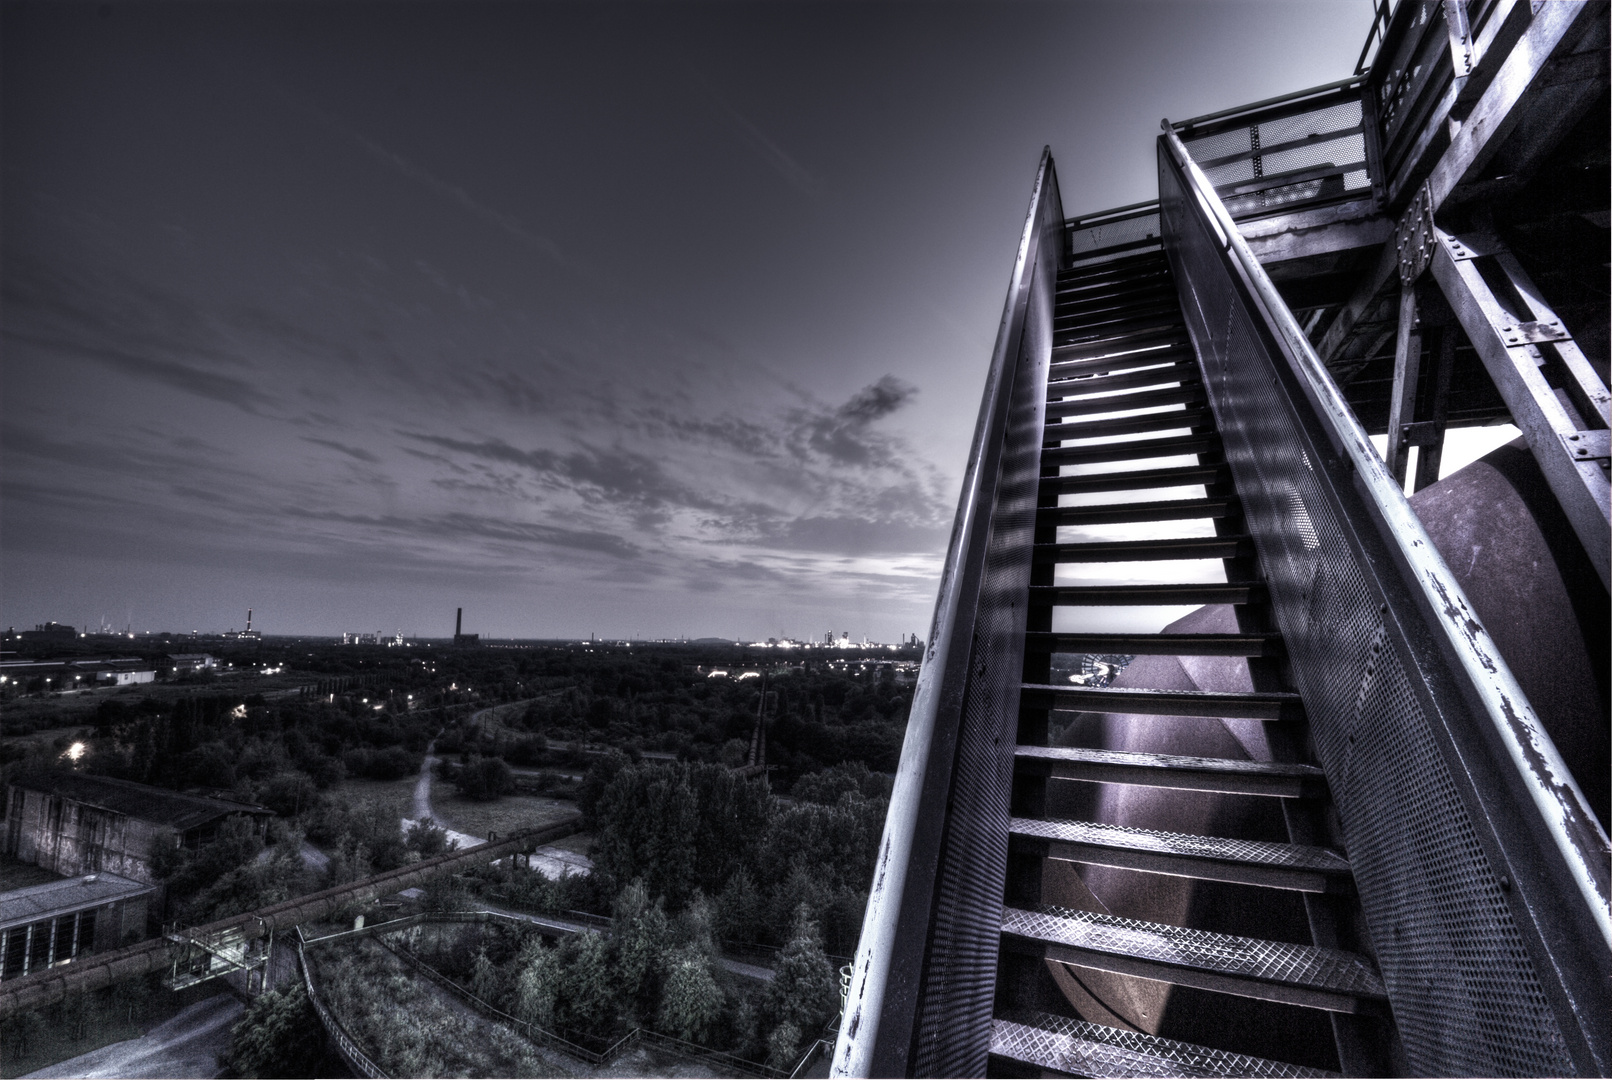 Stairway to Heaven (Landschaftspark)